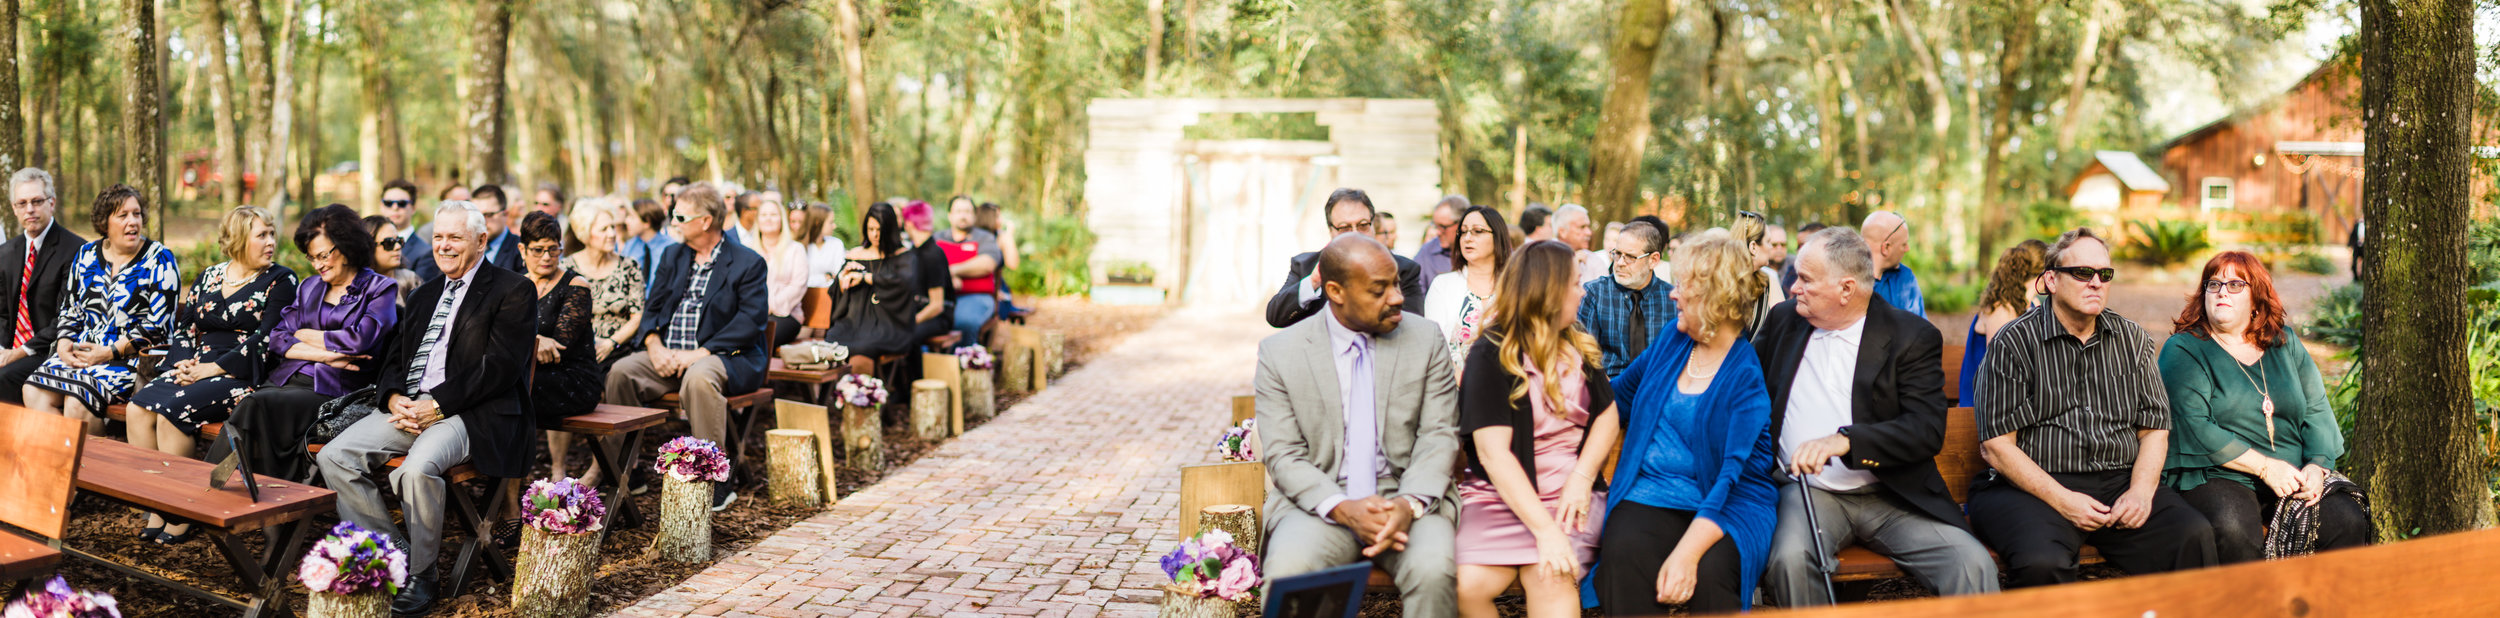 2019.01.12 Ashley and Nathan Bridle Oaks Wedding (206 of 1091).jpg